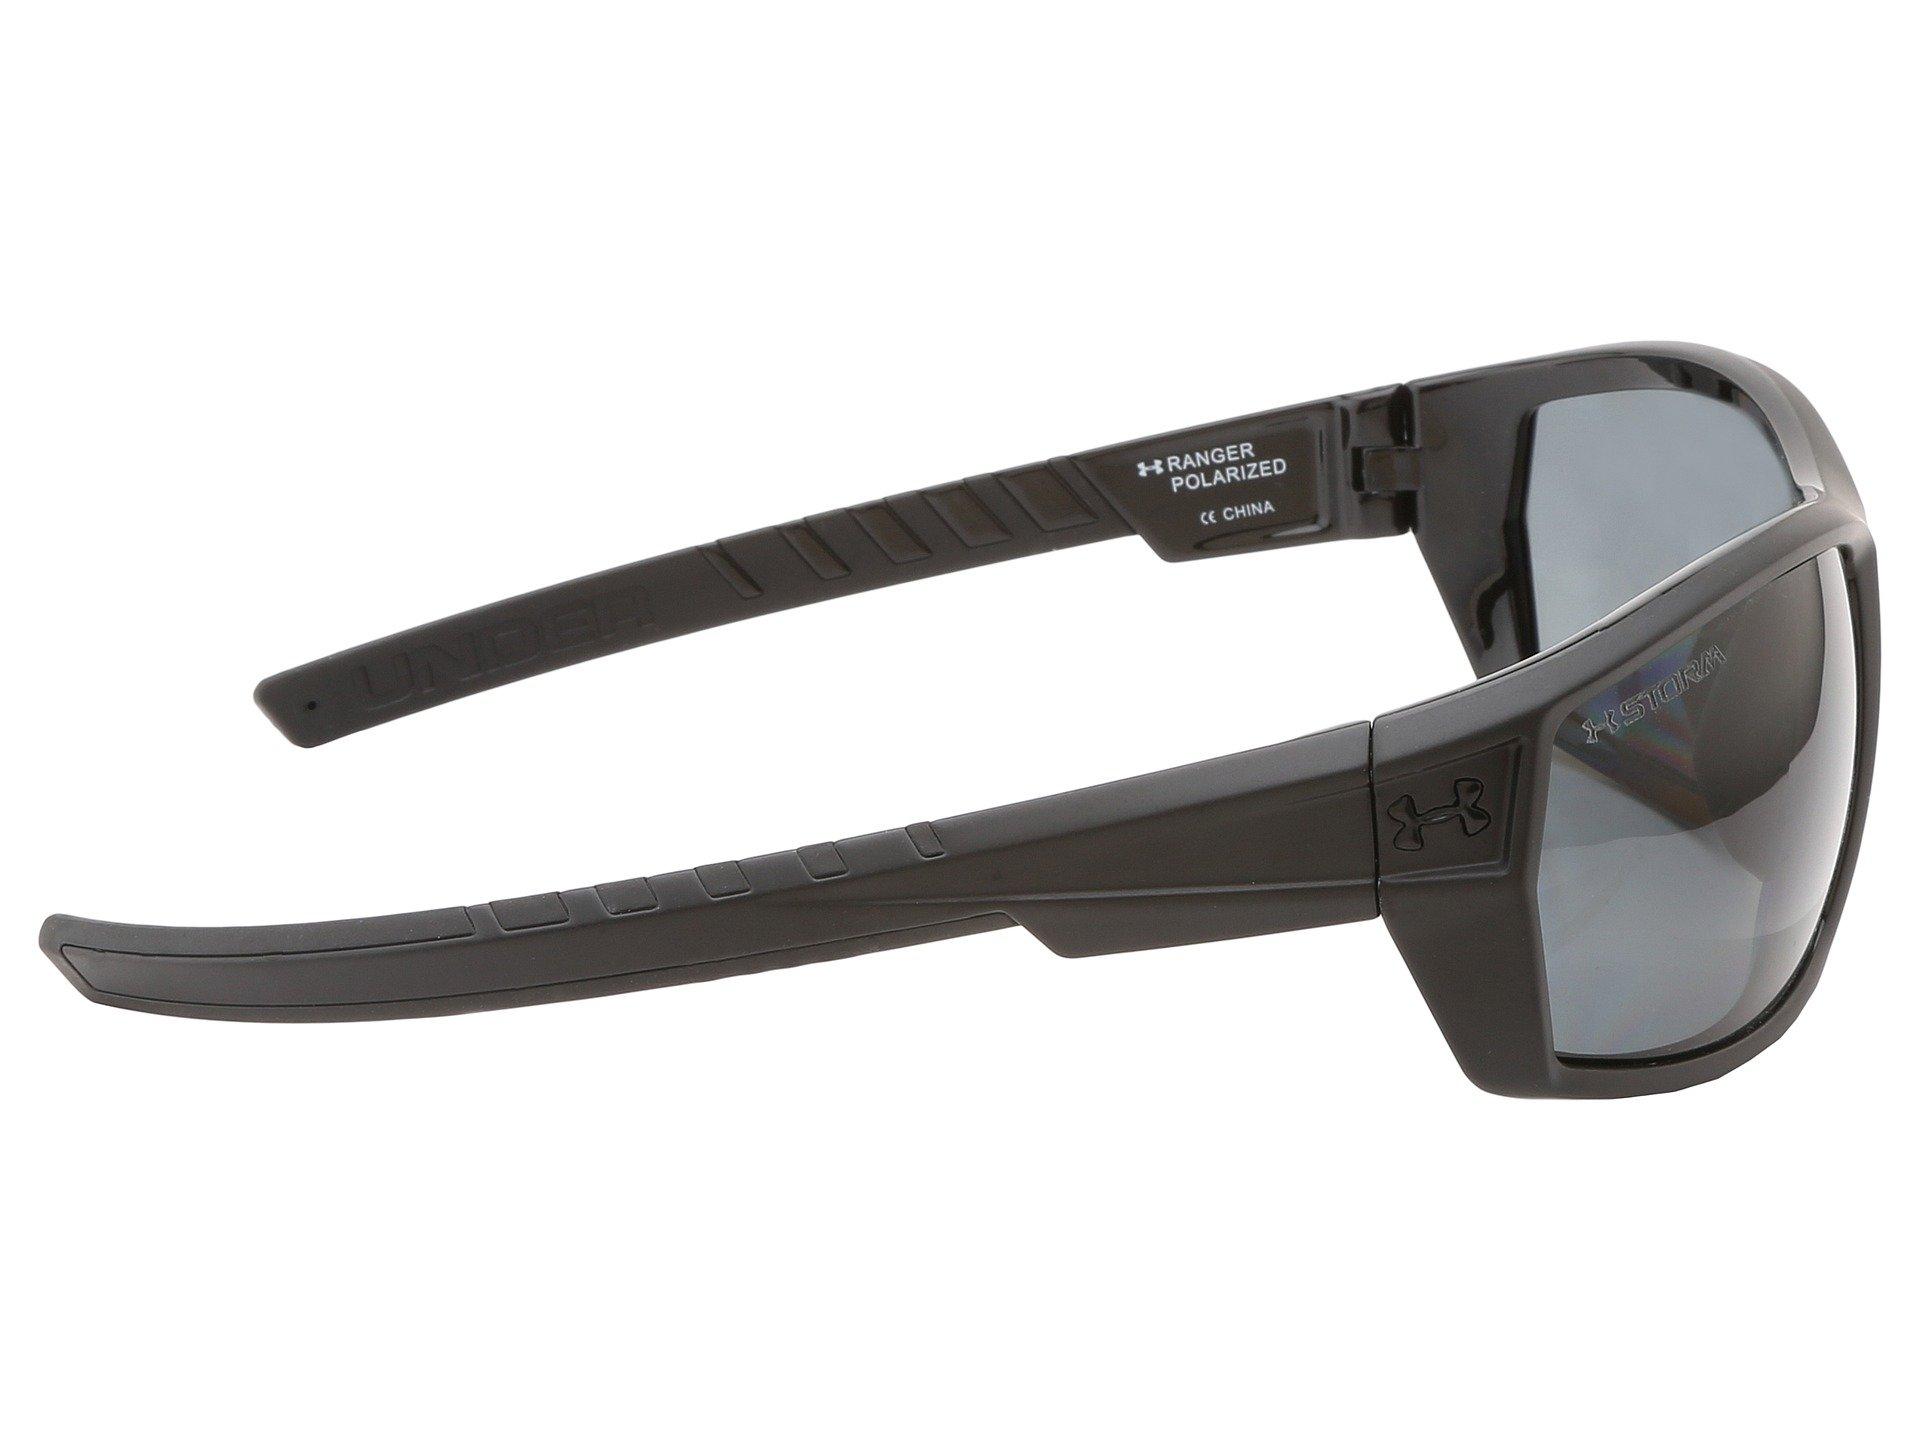 dca8e0d209a ... Captain Storm Fishing Glasses Satin Black Blue Lens. Under Armour UA  Ranger Storm at Zappos.com